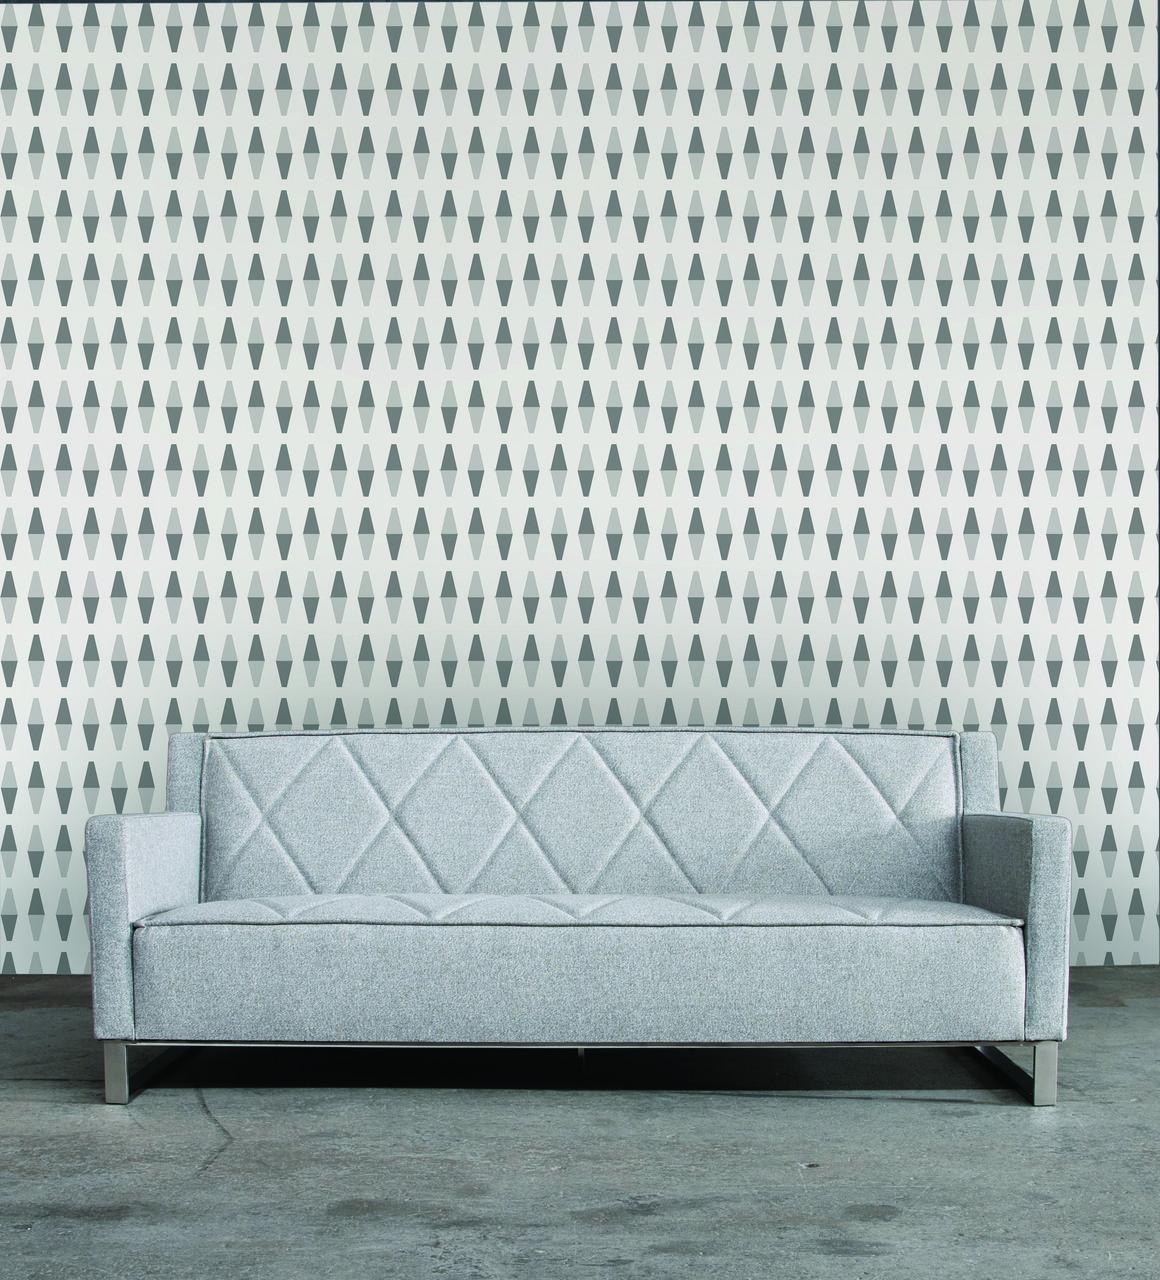 Interior Place Retrogeo Greyscale RE405 Wallpaper, 62